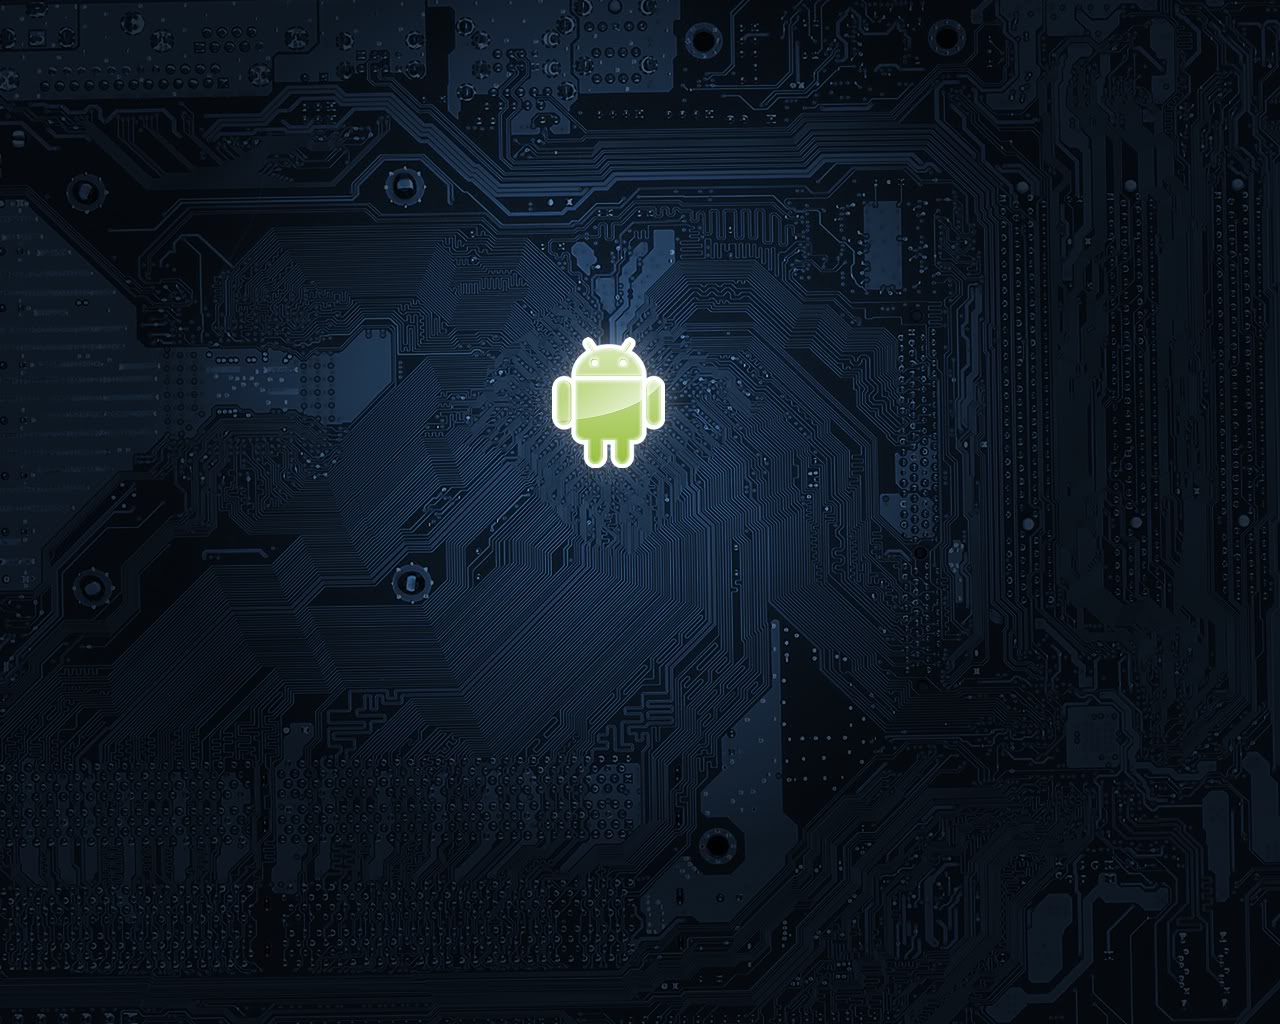 Mega Wallpapers HD: Android Wallpaper